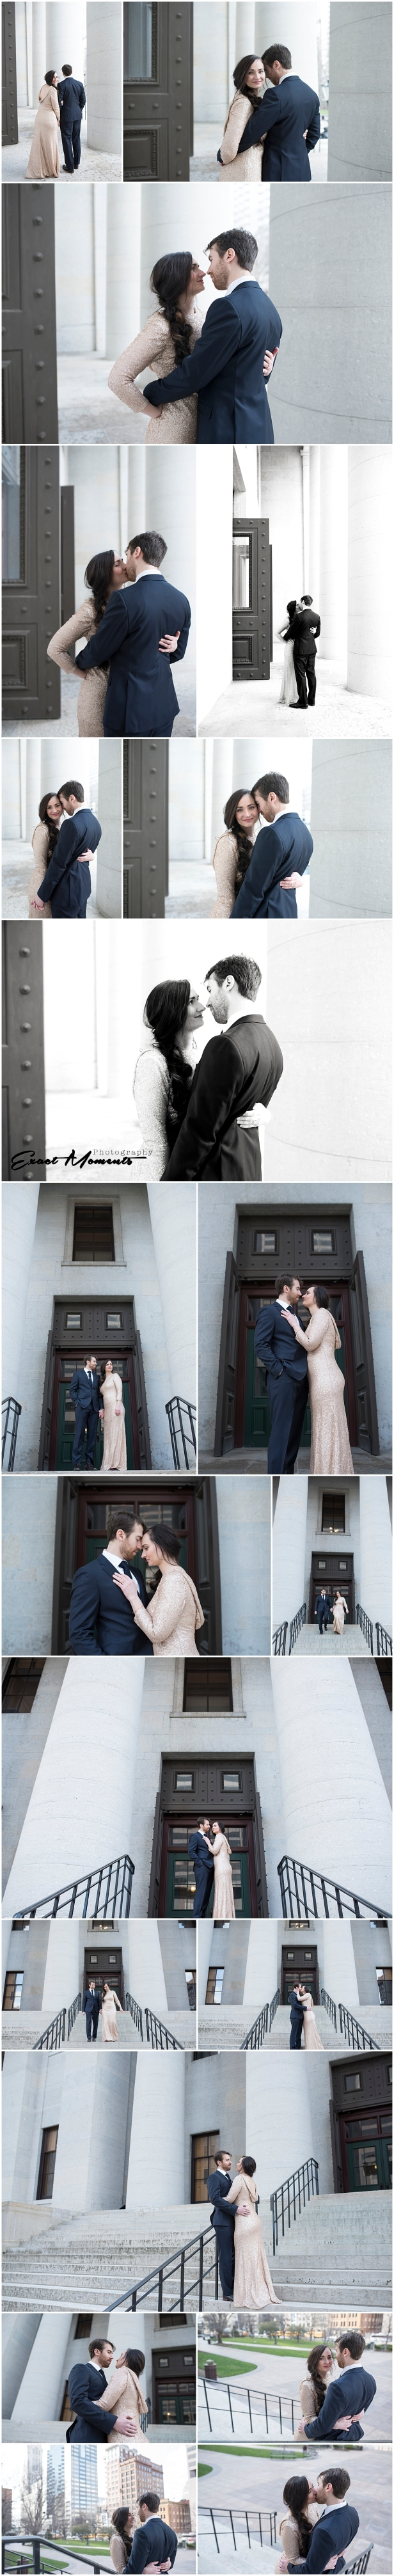 Ohio Statehouse Bride and Groom Photos